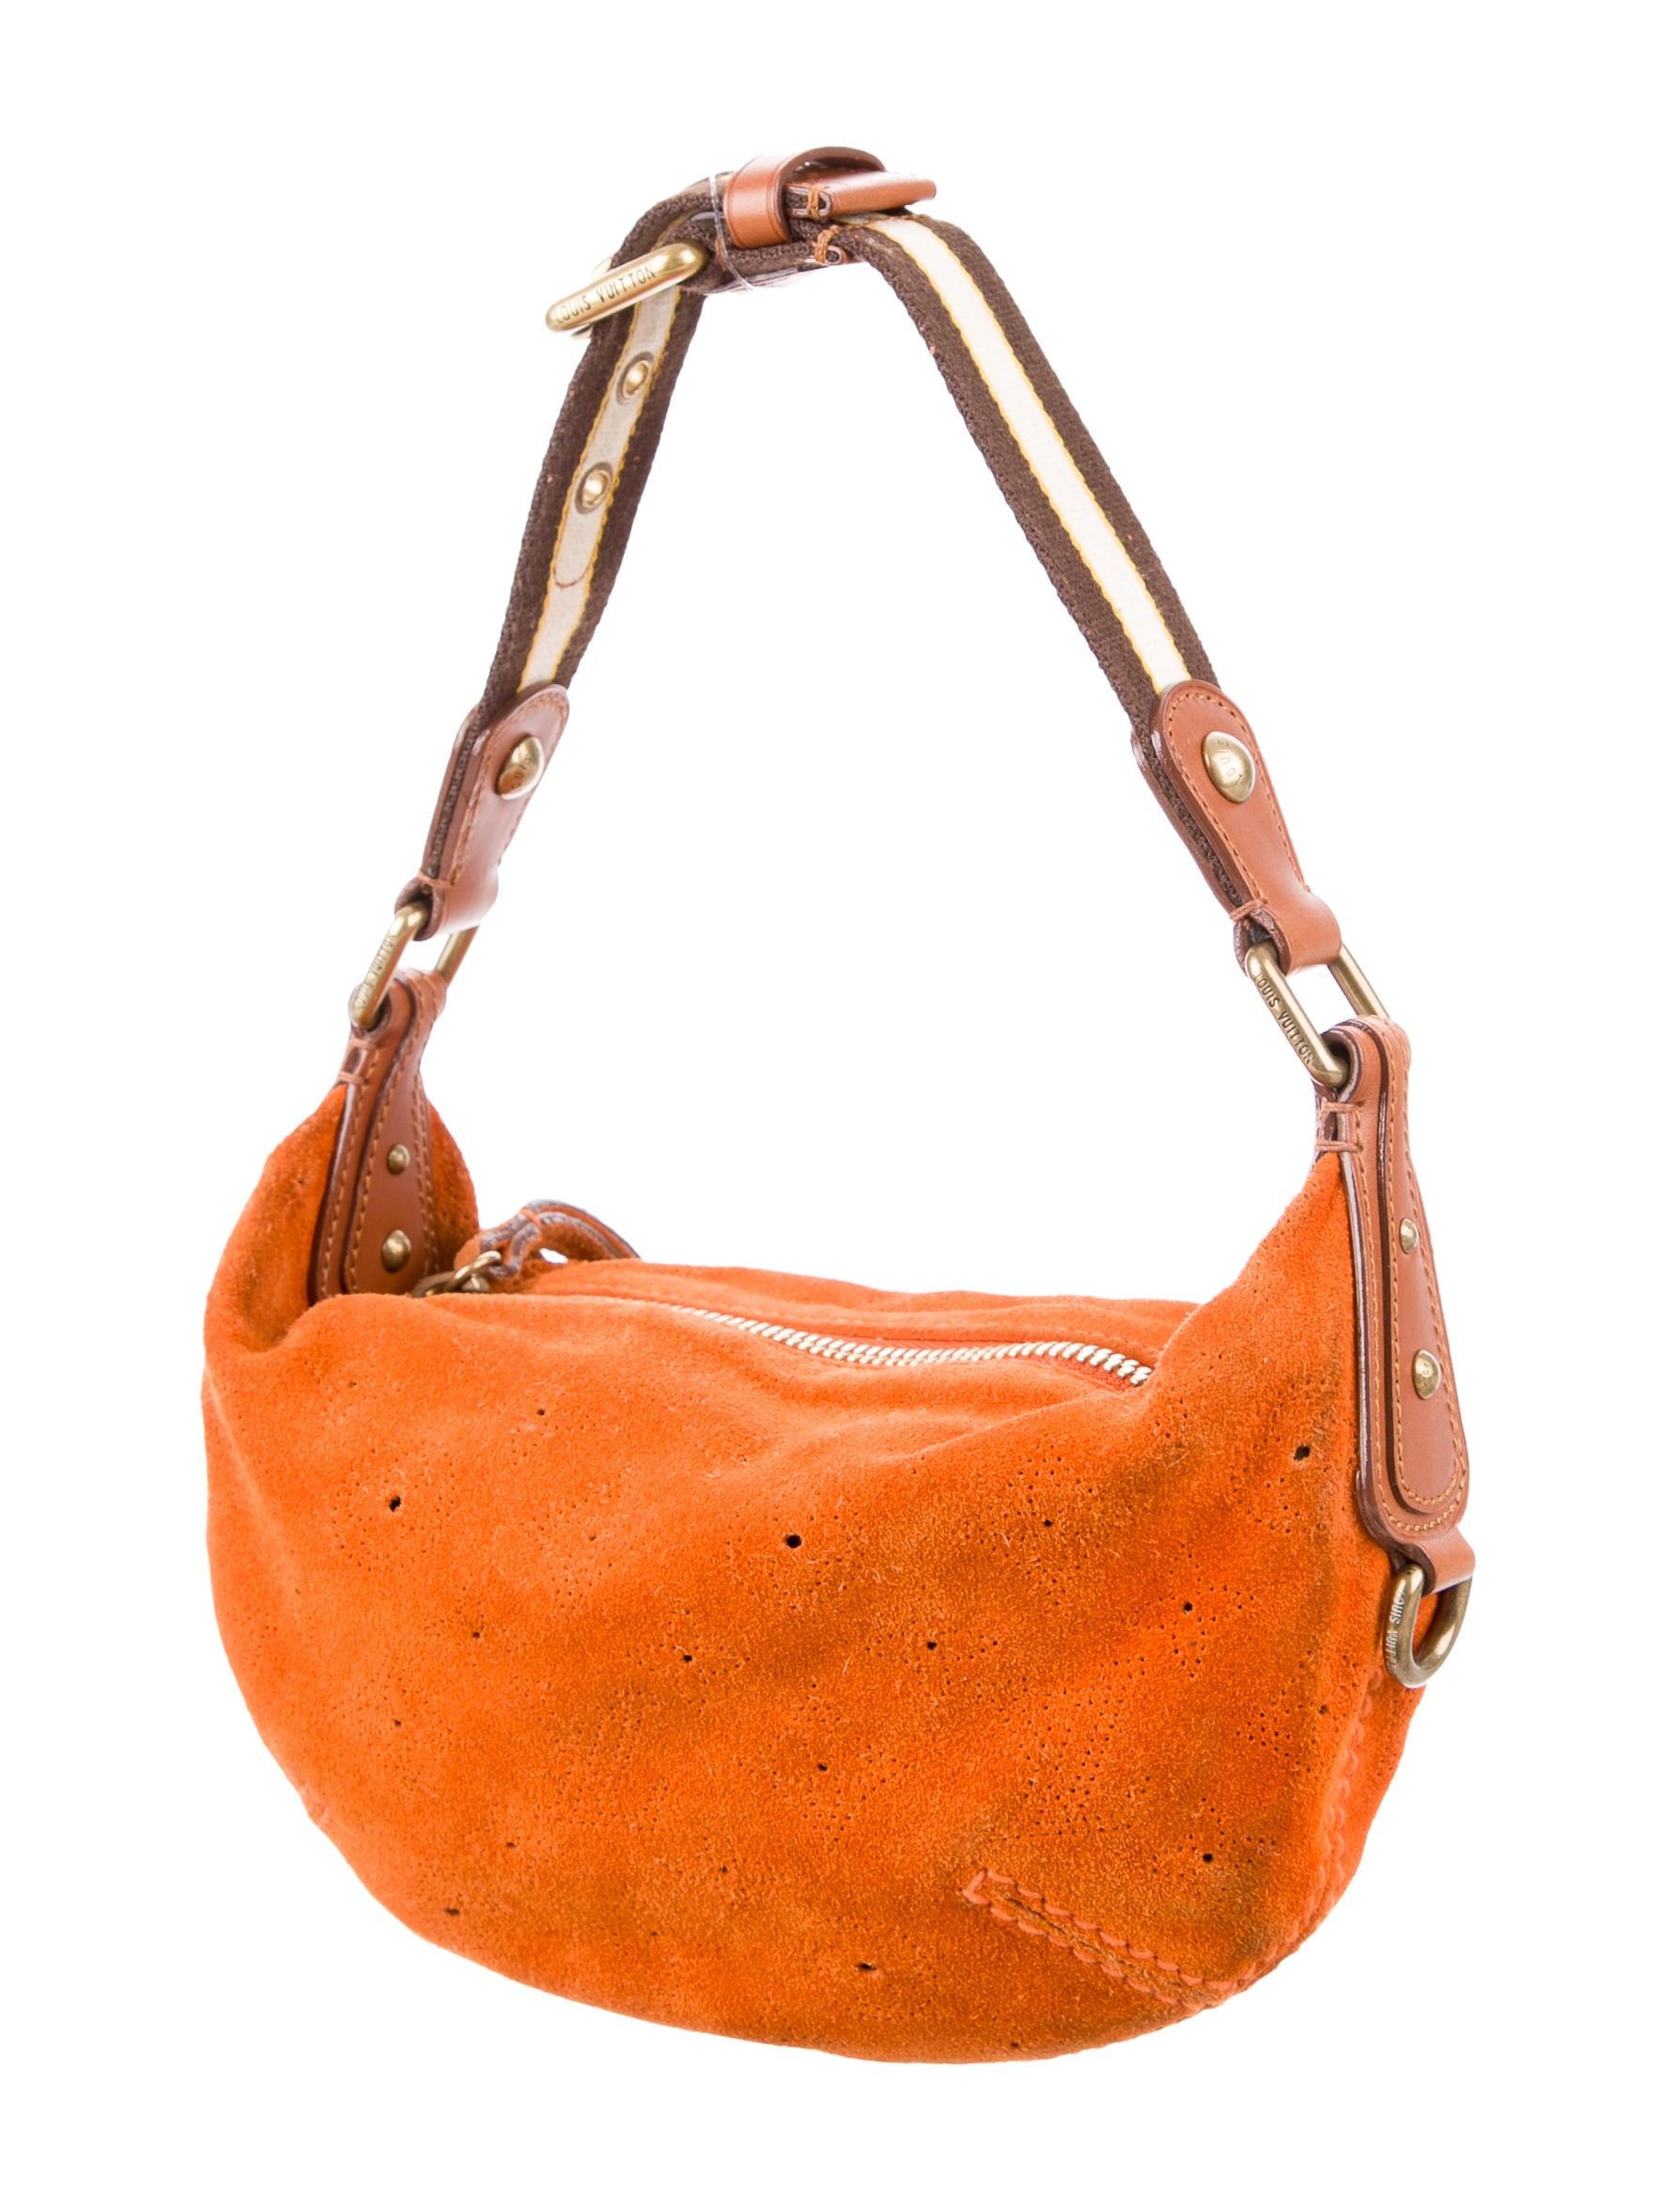 Louis Vuitton Mahina Onatah Pochette - Handbags - LOU105249  931d8f4def53a